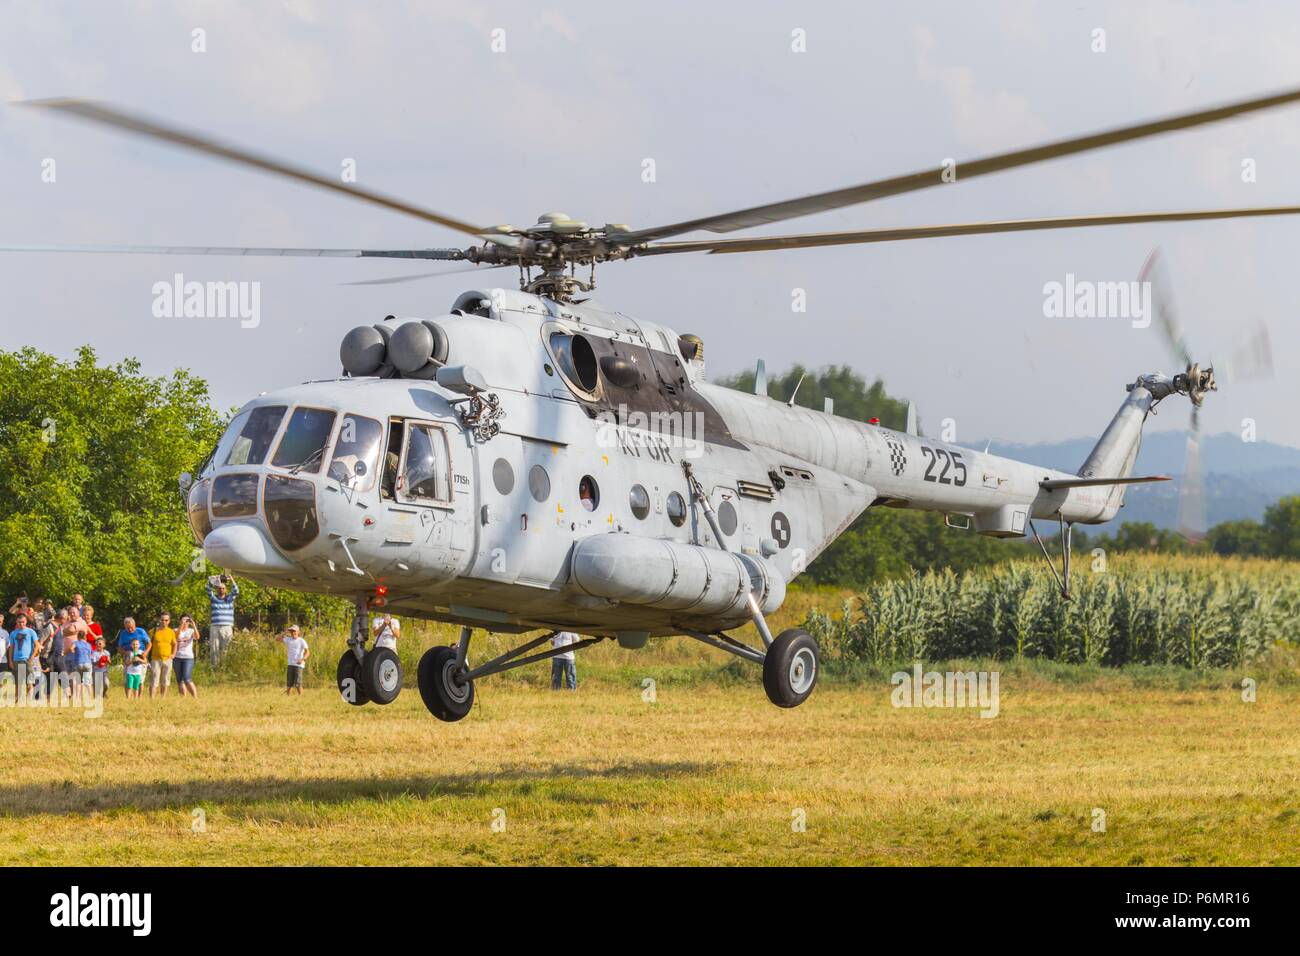 AviationStock Photo